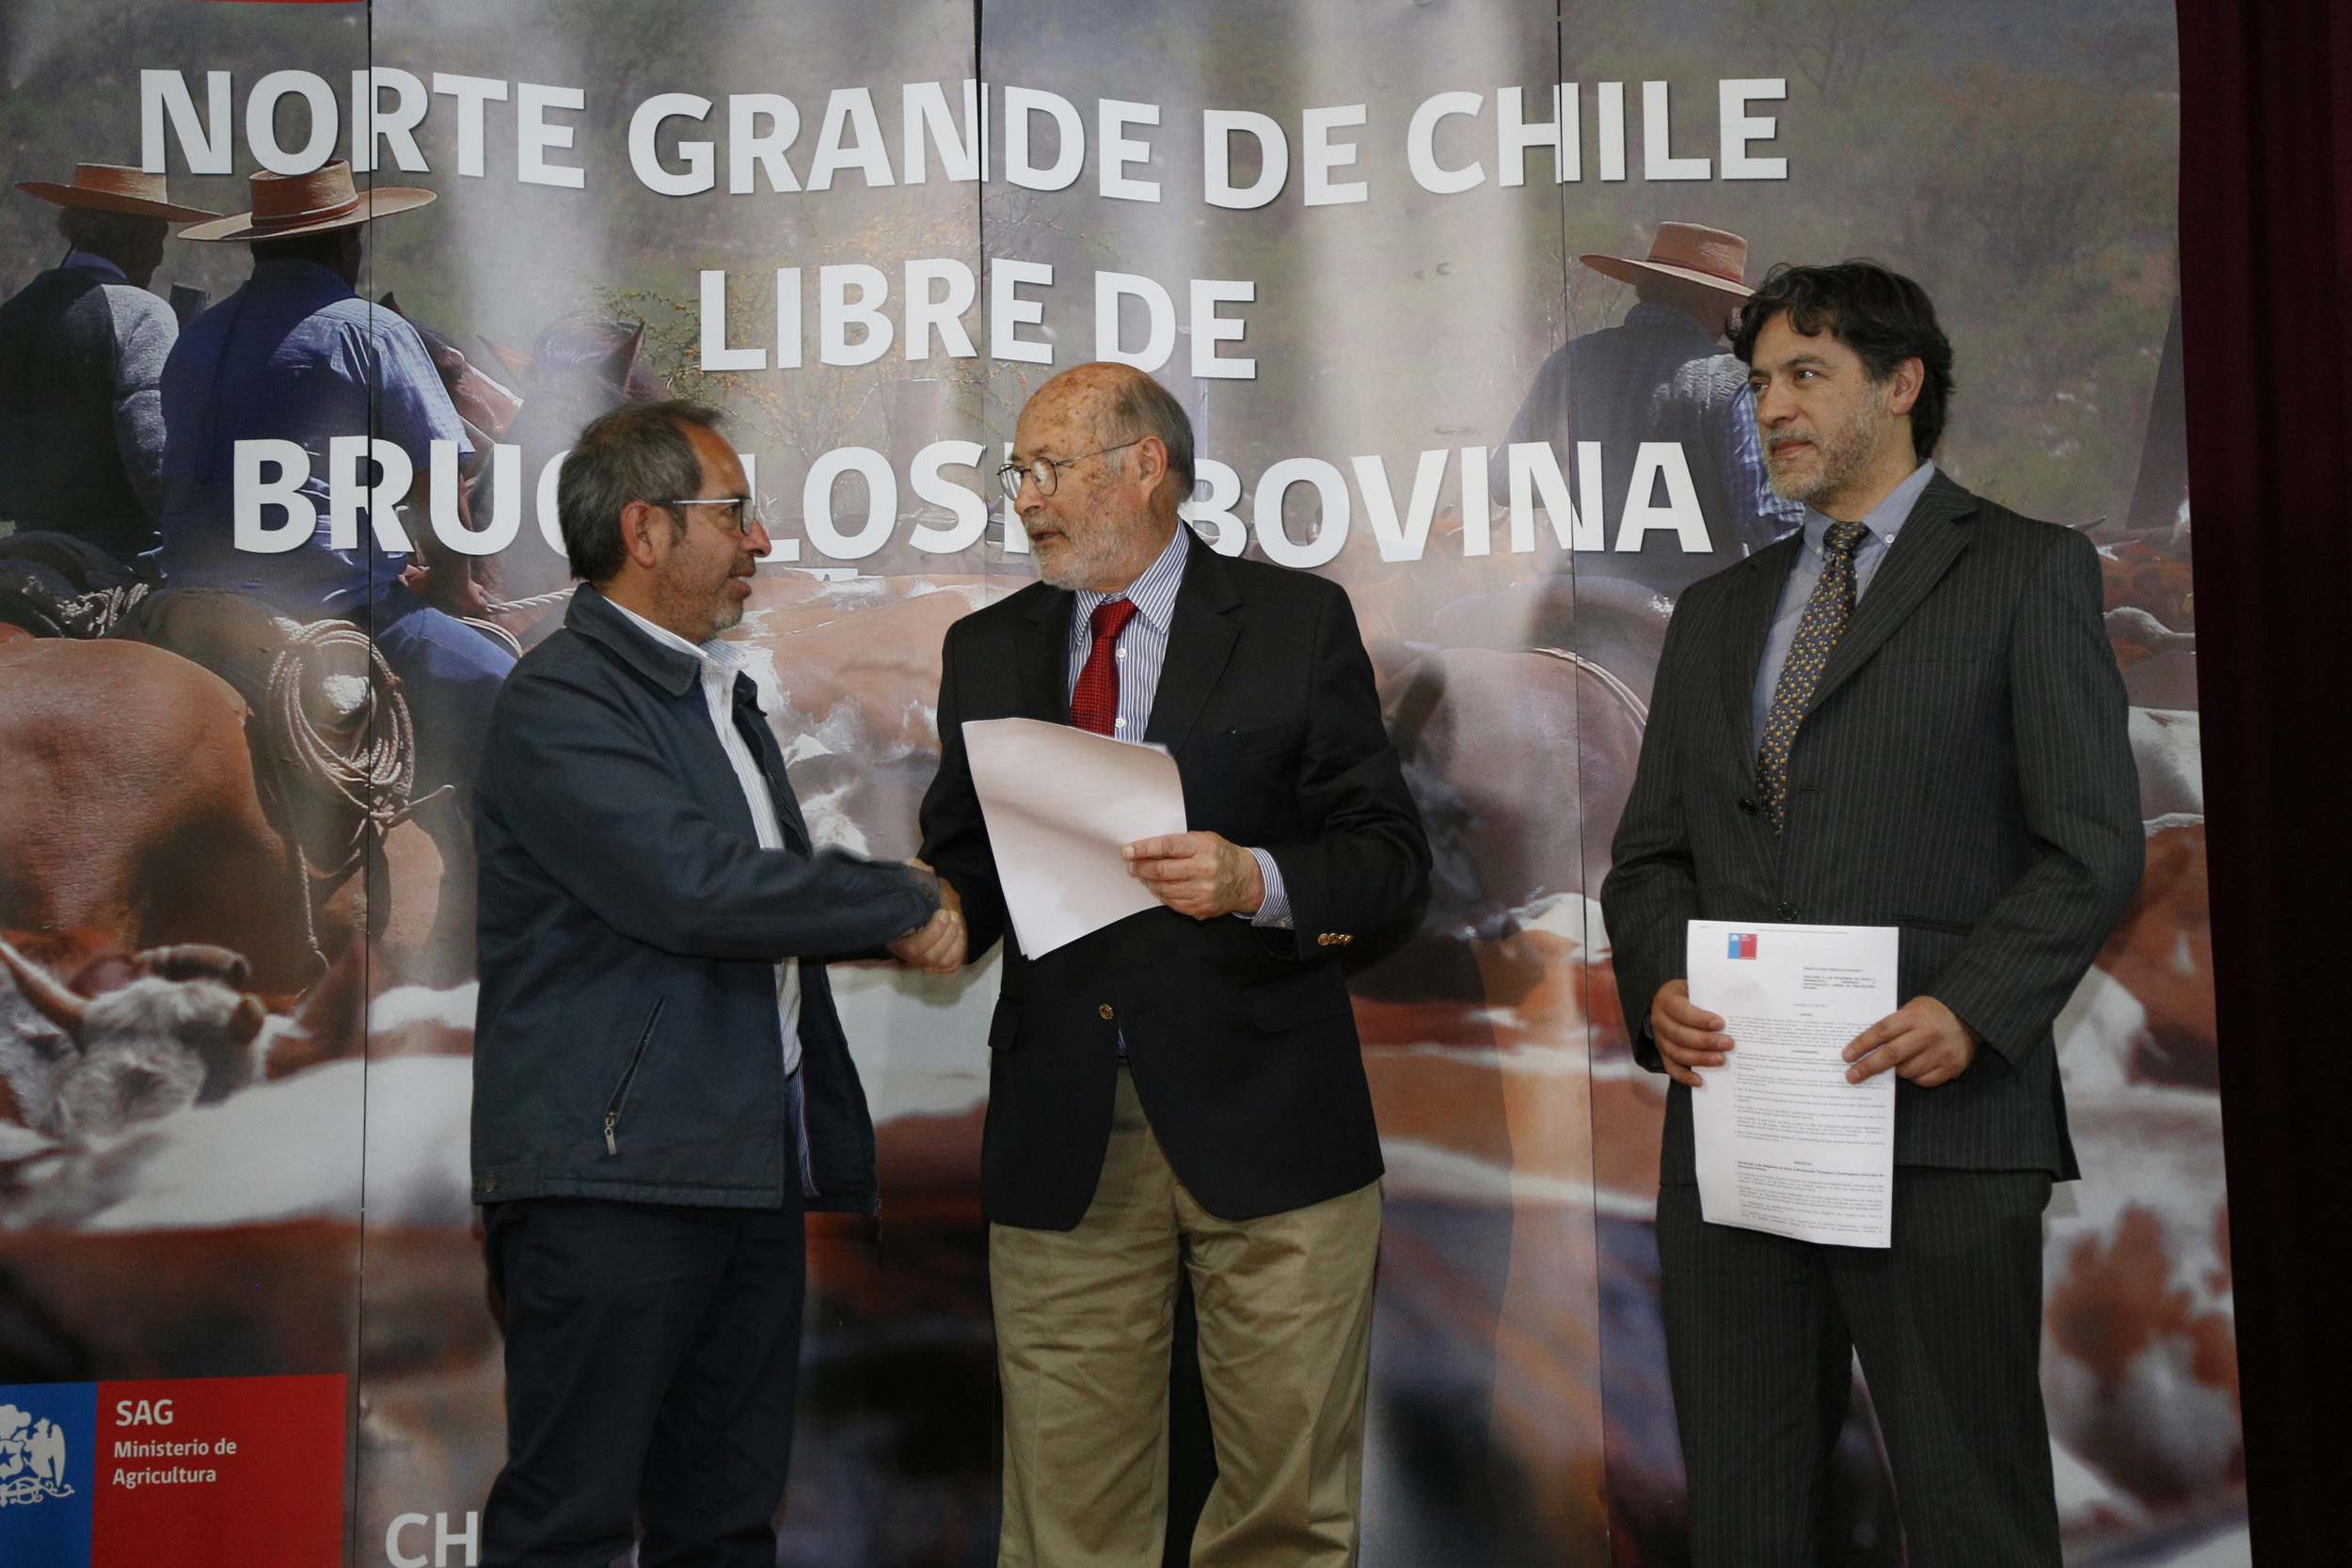 Norte de Chile libre de brucelosis bovina